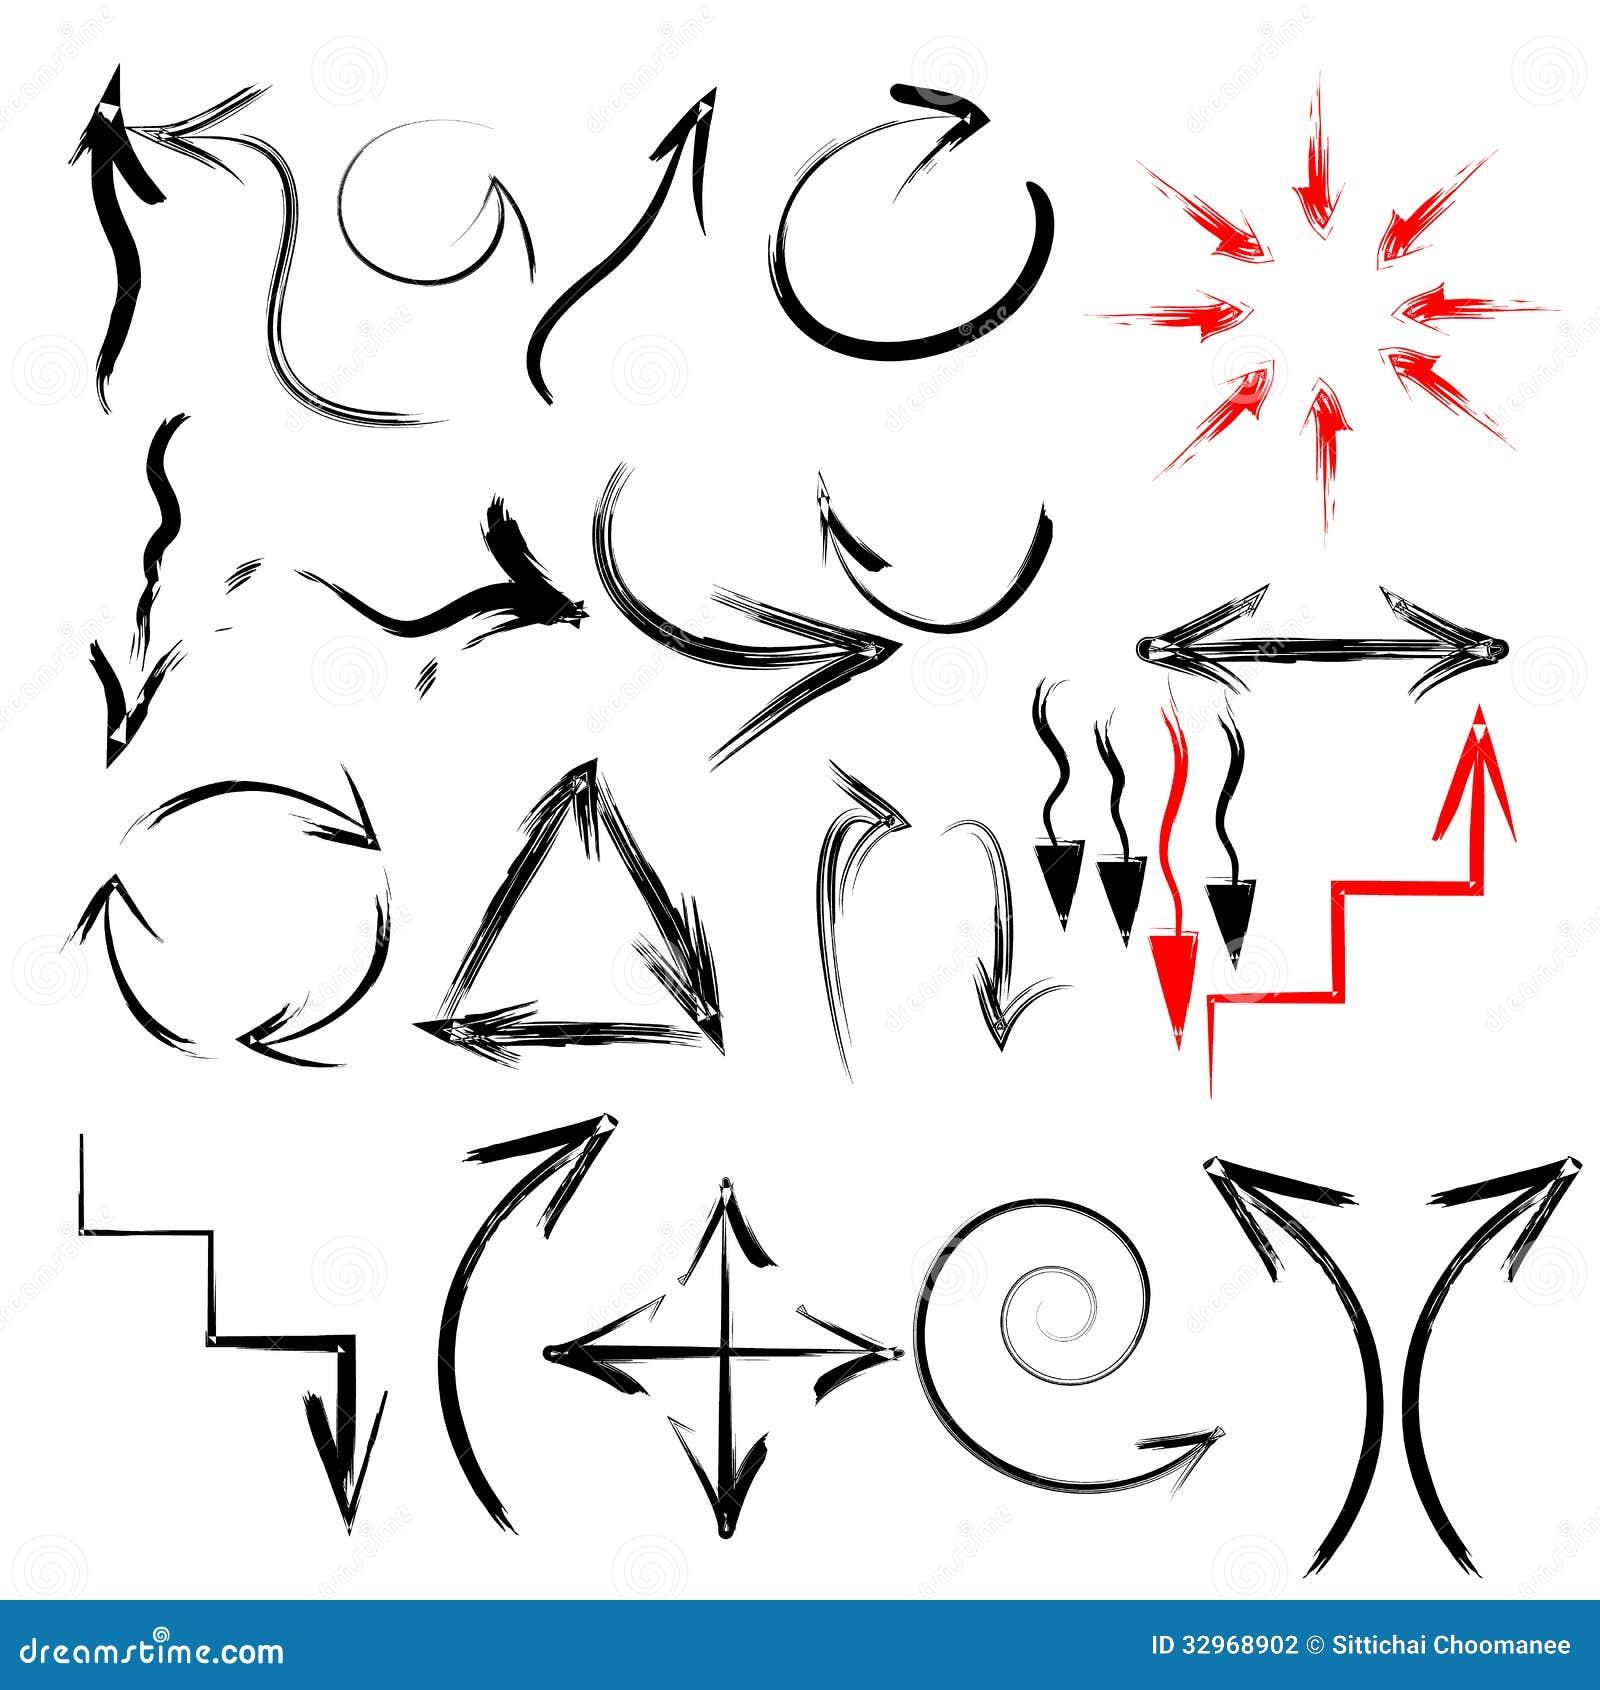 Pin Stroke Vector Brush Strokes Wave Graphicriver on Pinterest